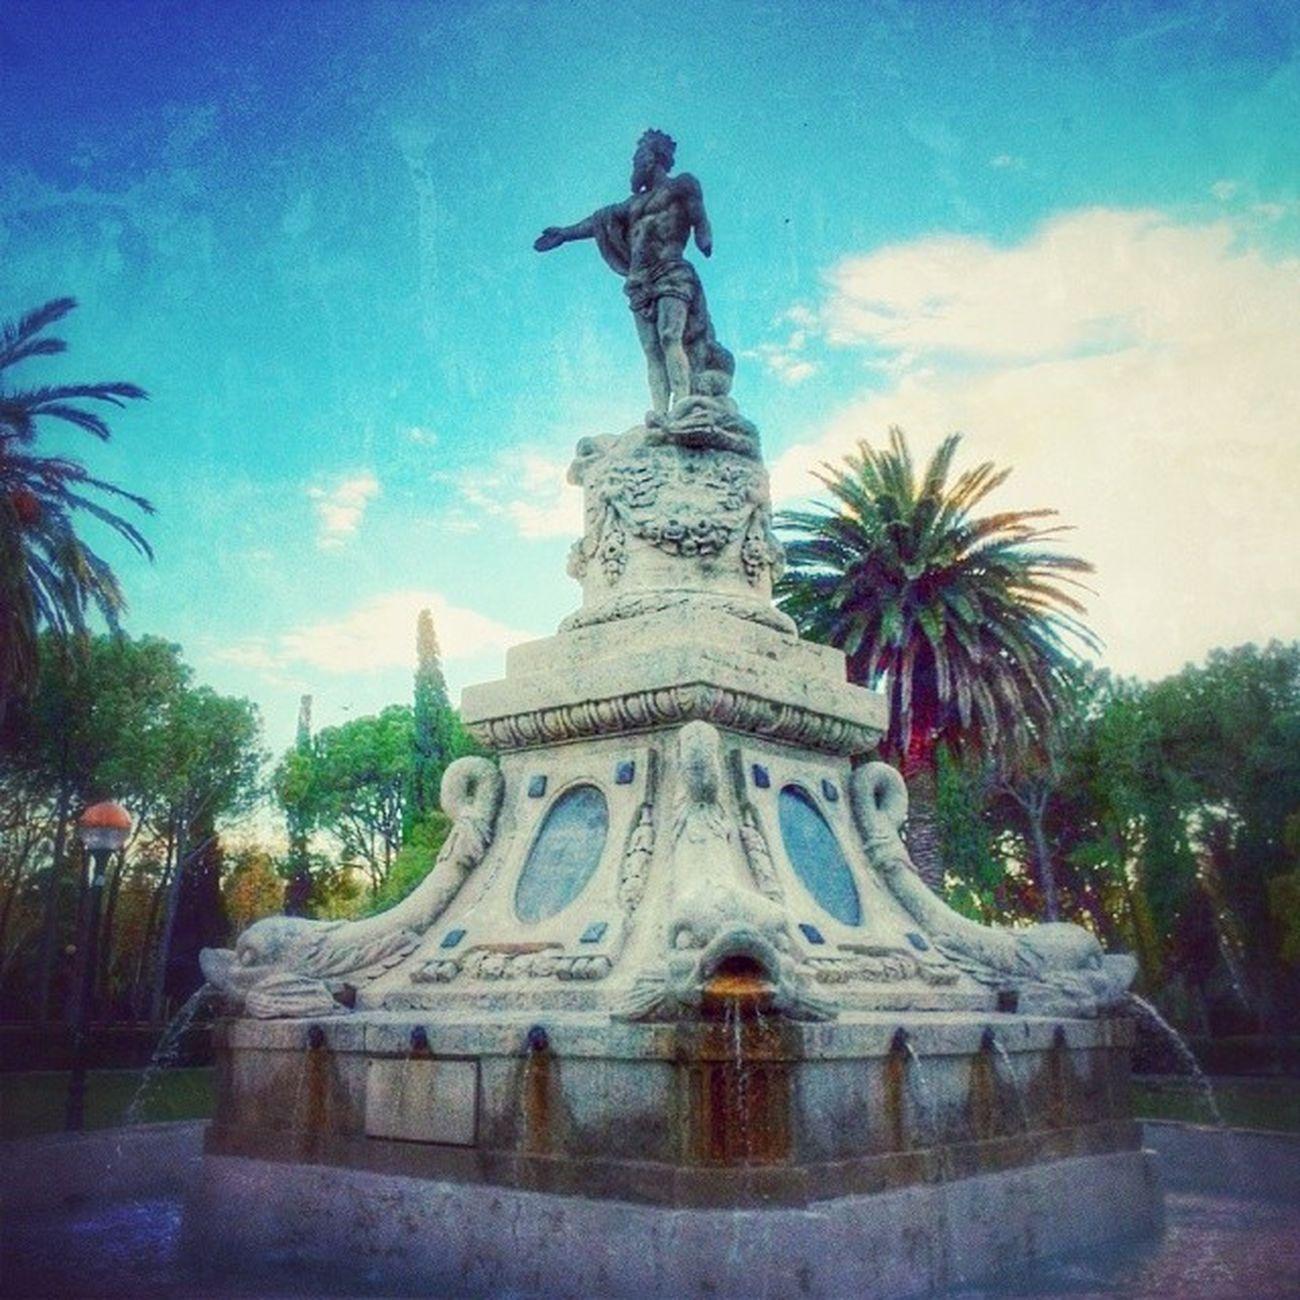 Estatua de Neptuno en el ParqueJoseAntonioLabordeta Igersaragon igerszgz Zaragoza